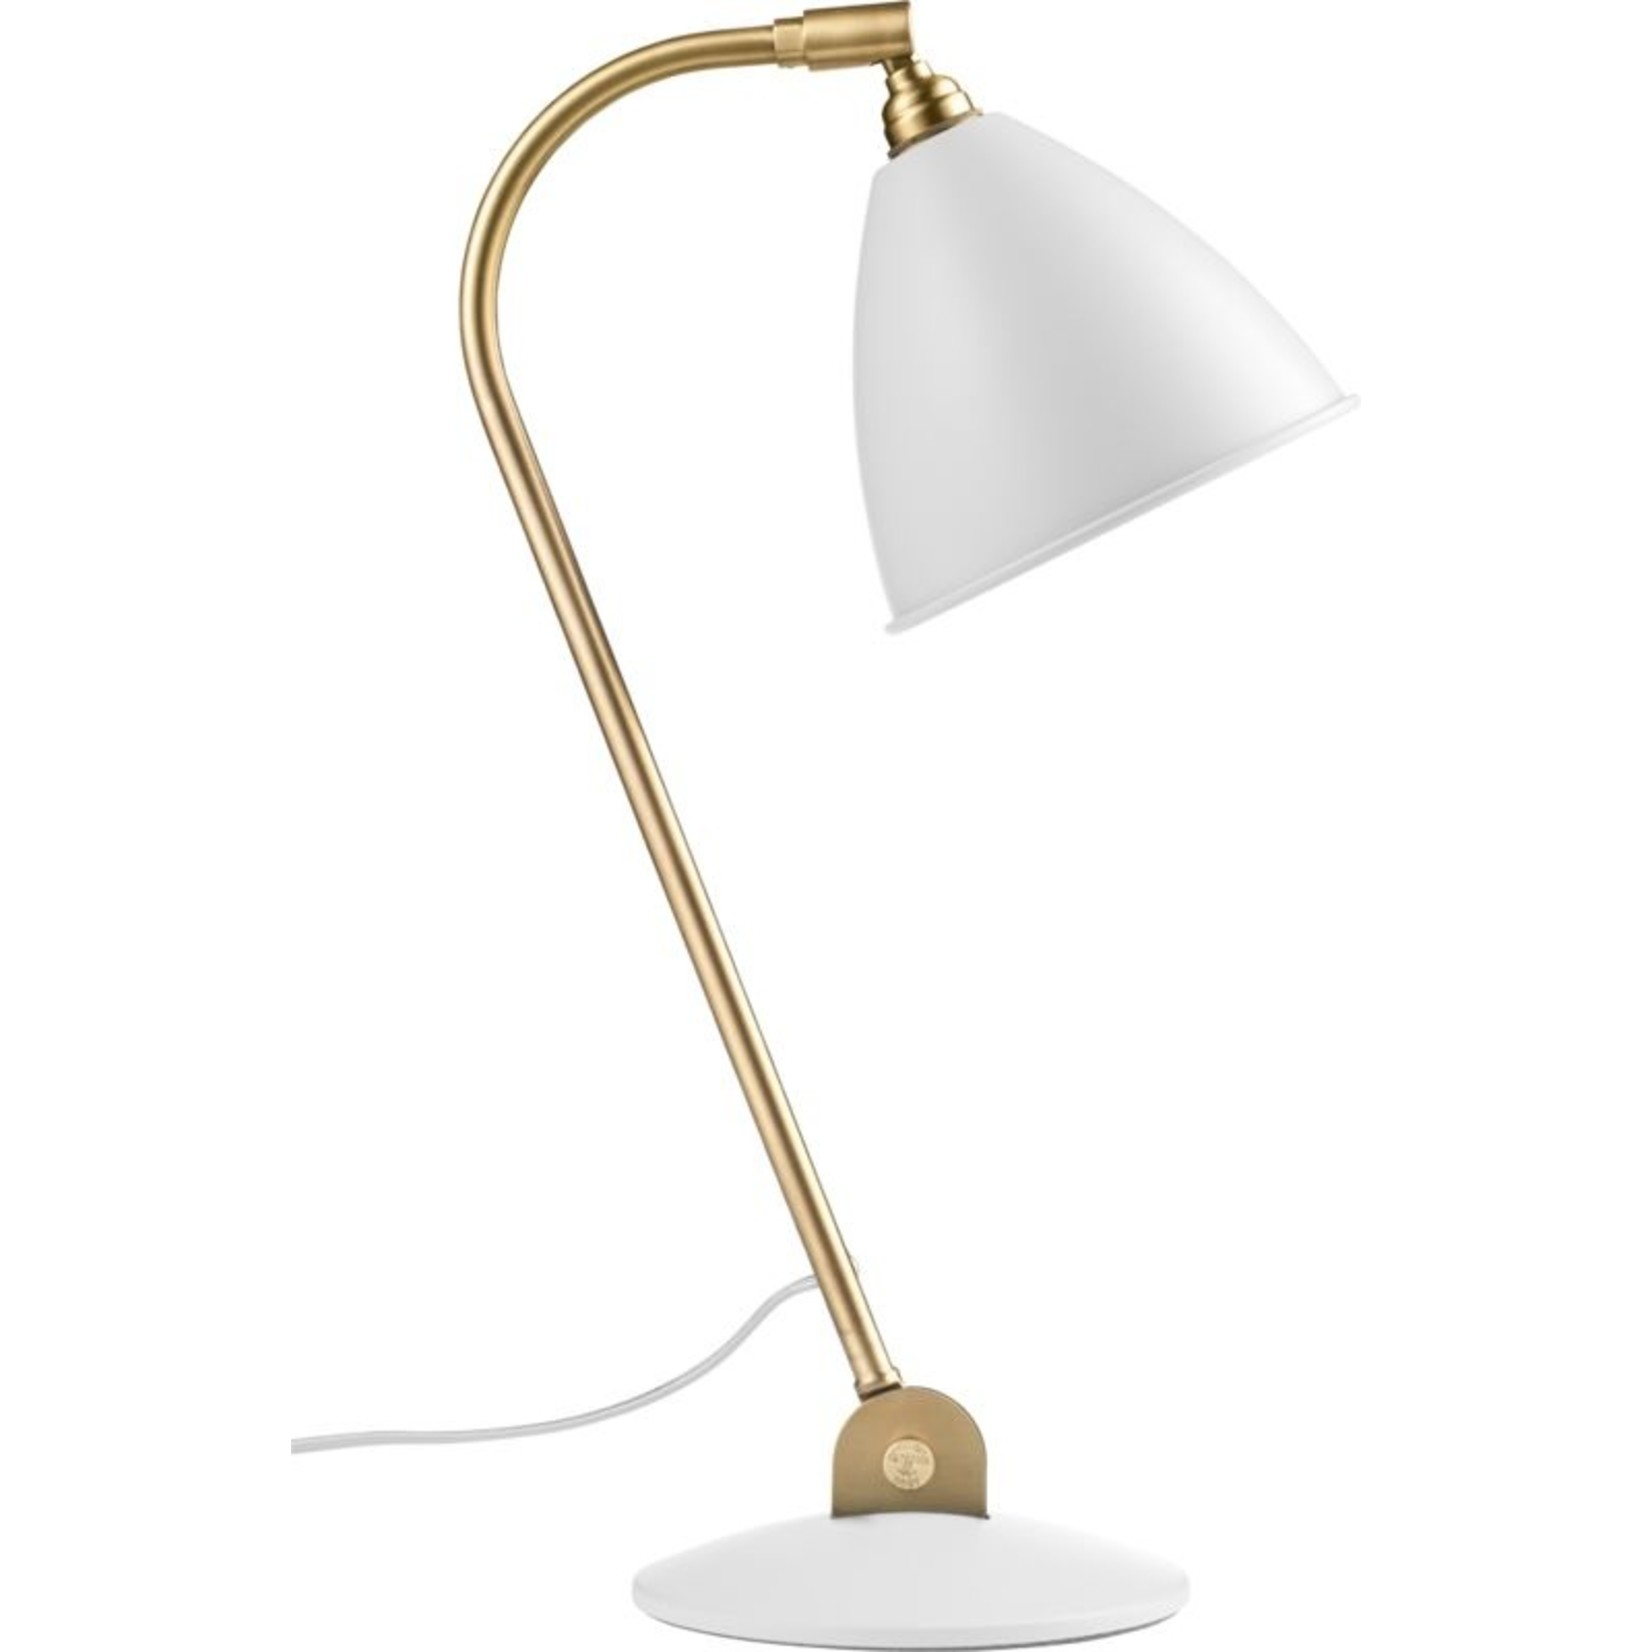 Gubi BL2 Table Lamp - Ø16   Brass Base & Soft White Semi Matt Shade